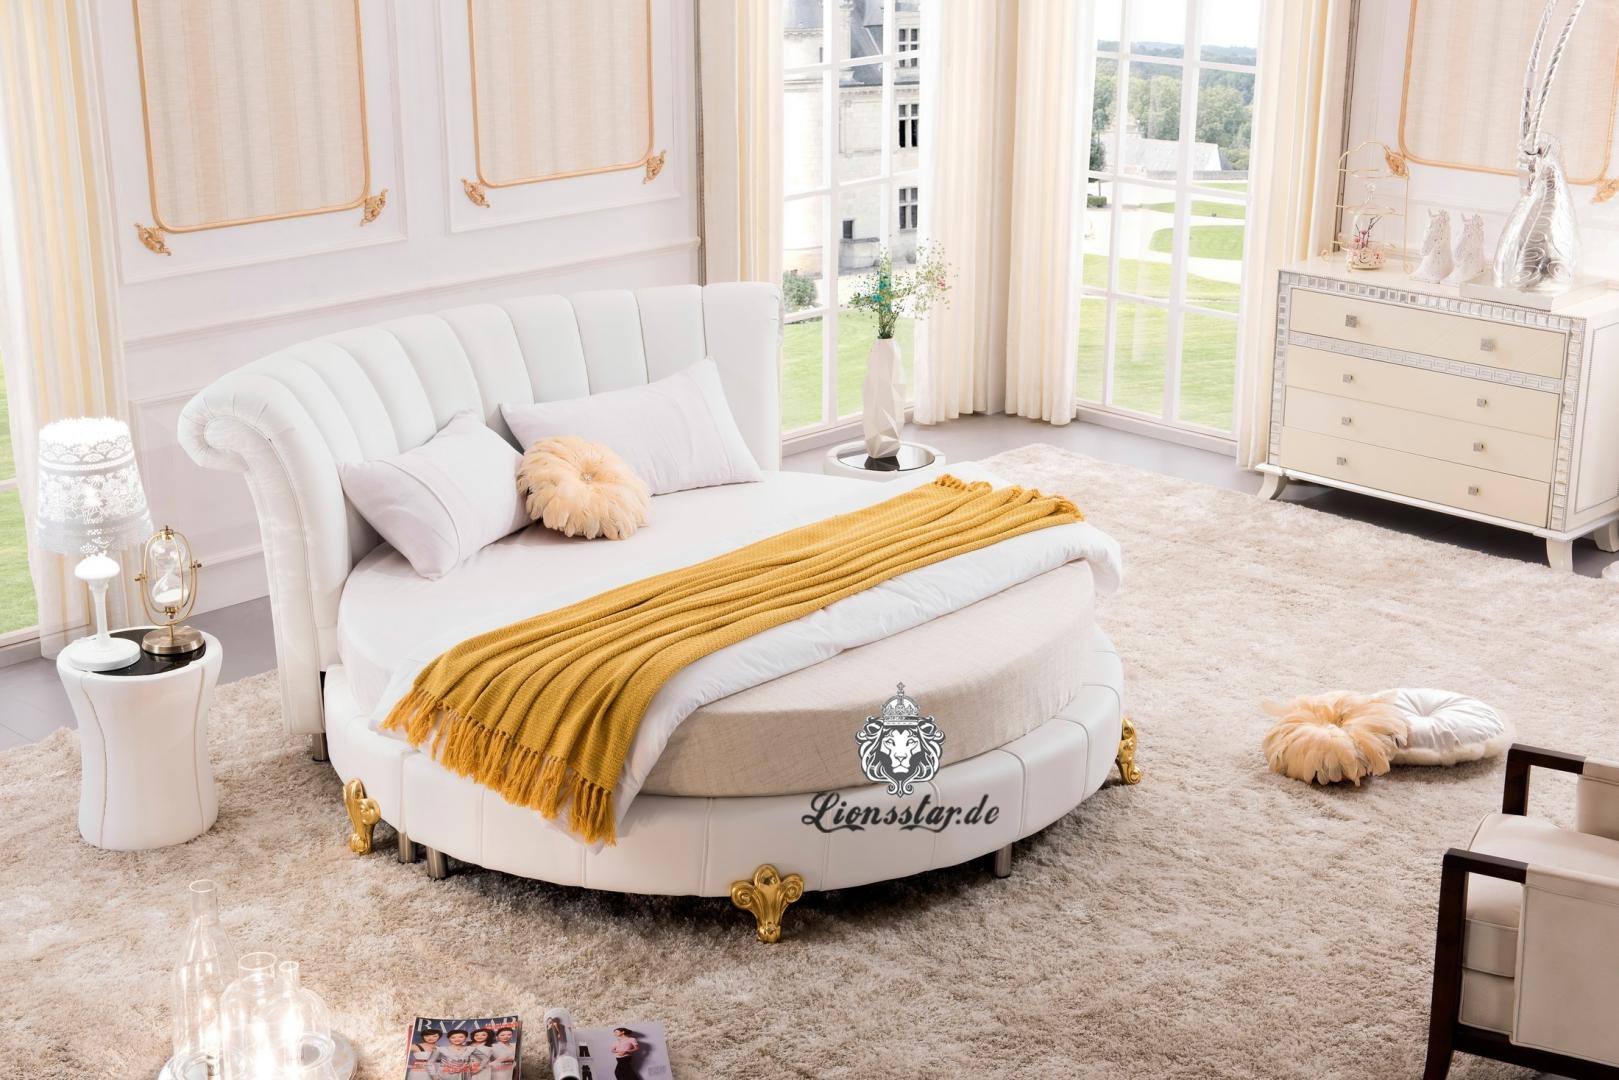 bett design turtlebett with bett design wooden bed design segno satarossa integrated. Black Bedroom Furniture Sets. Home Design Ideas